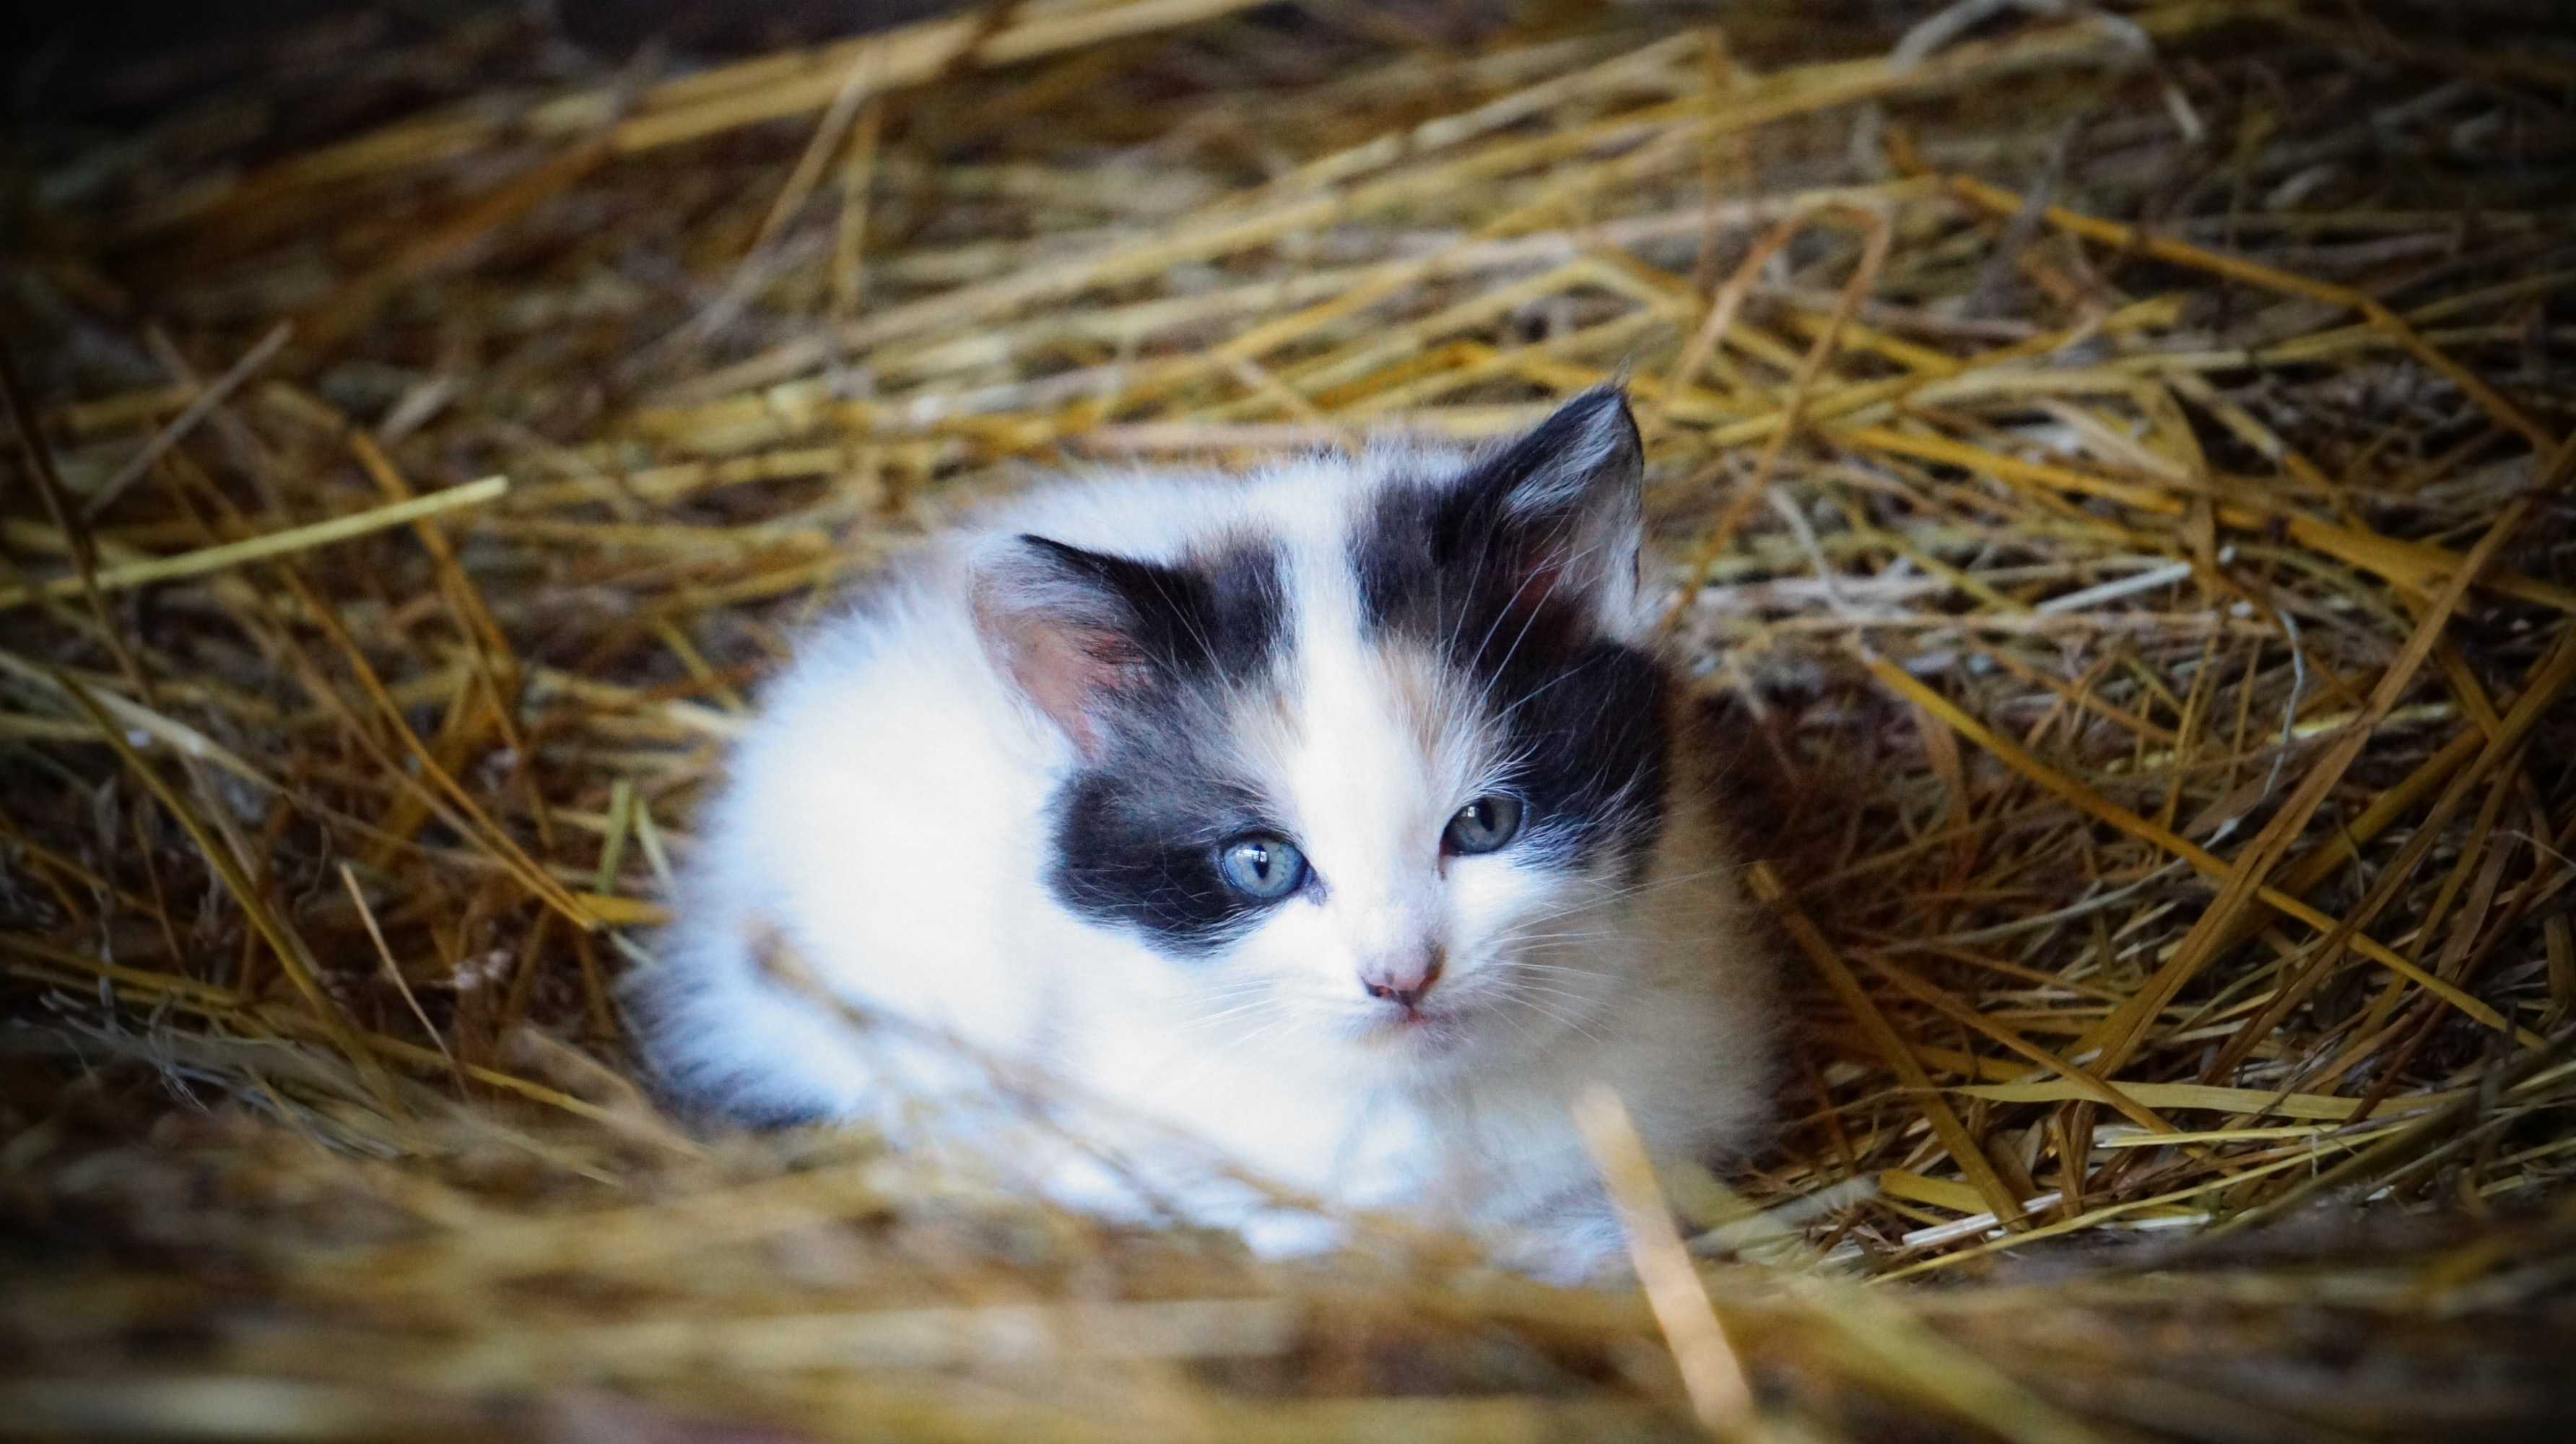 cat lying on hay